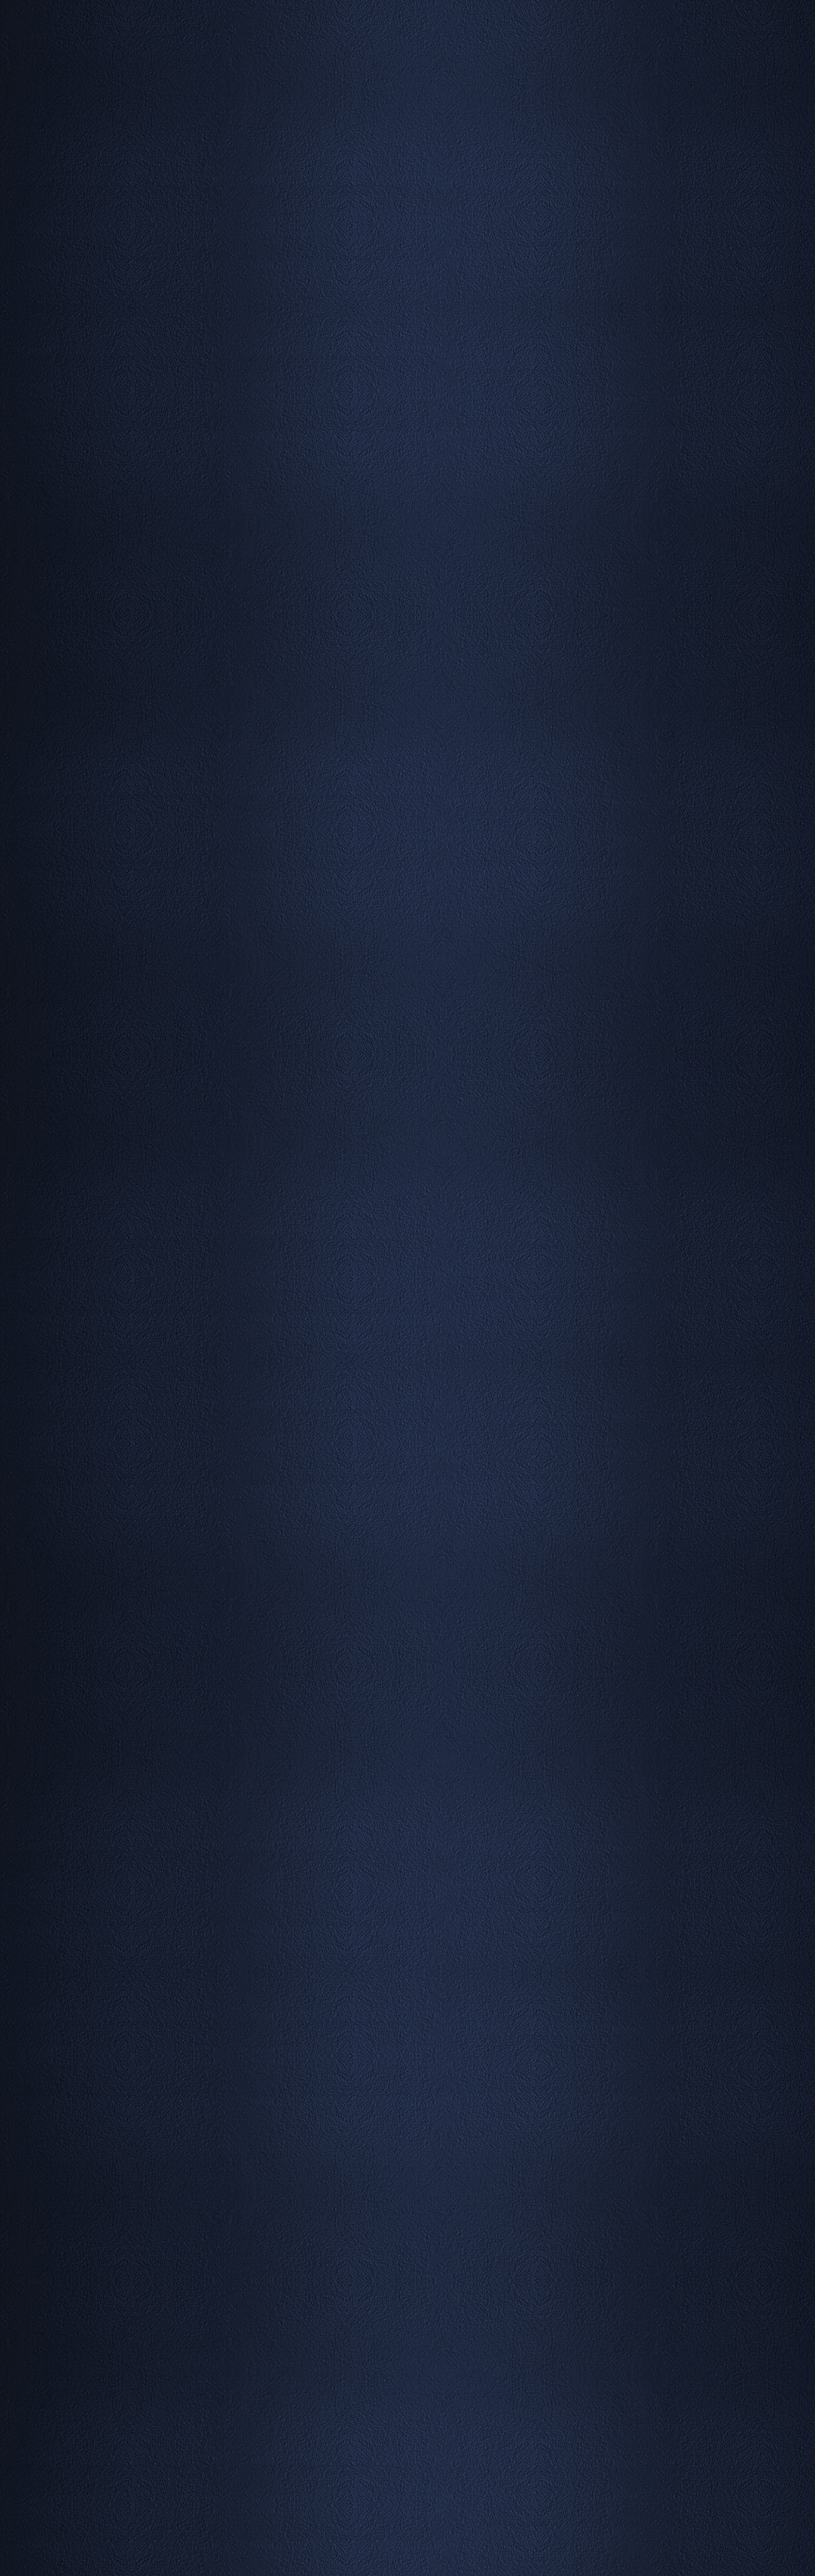 blue_long.jpg